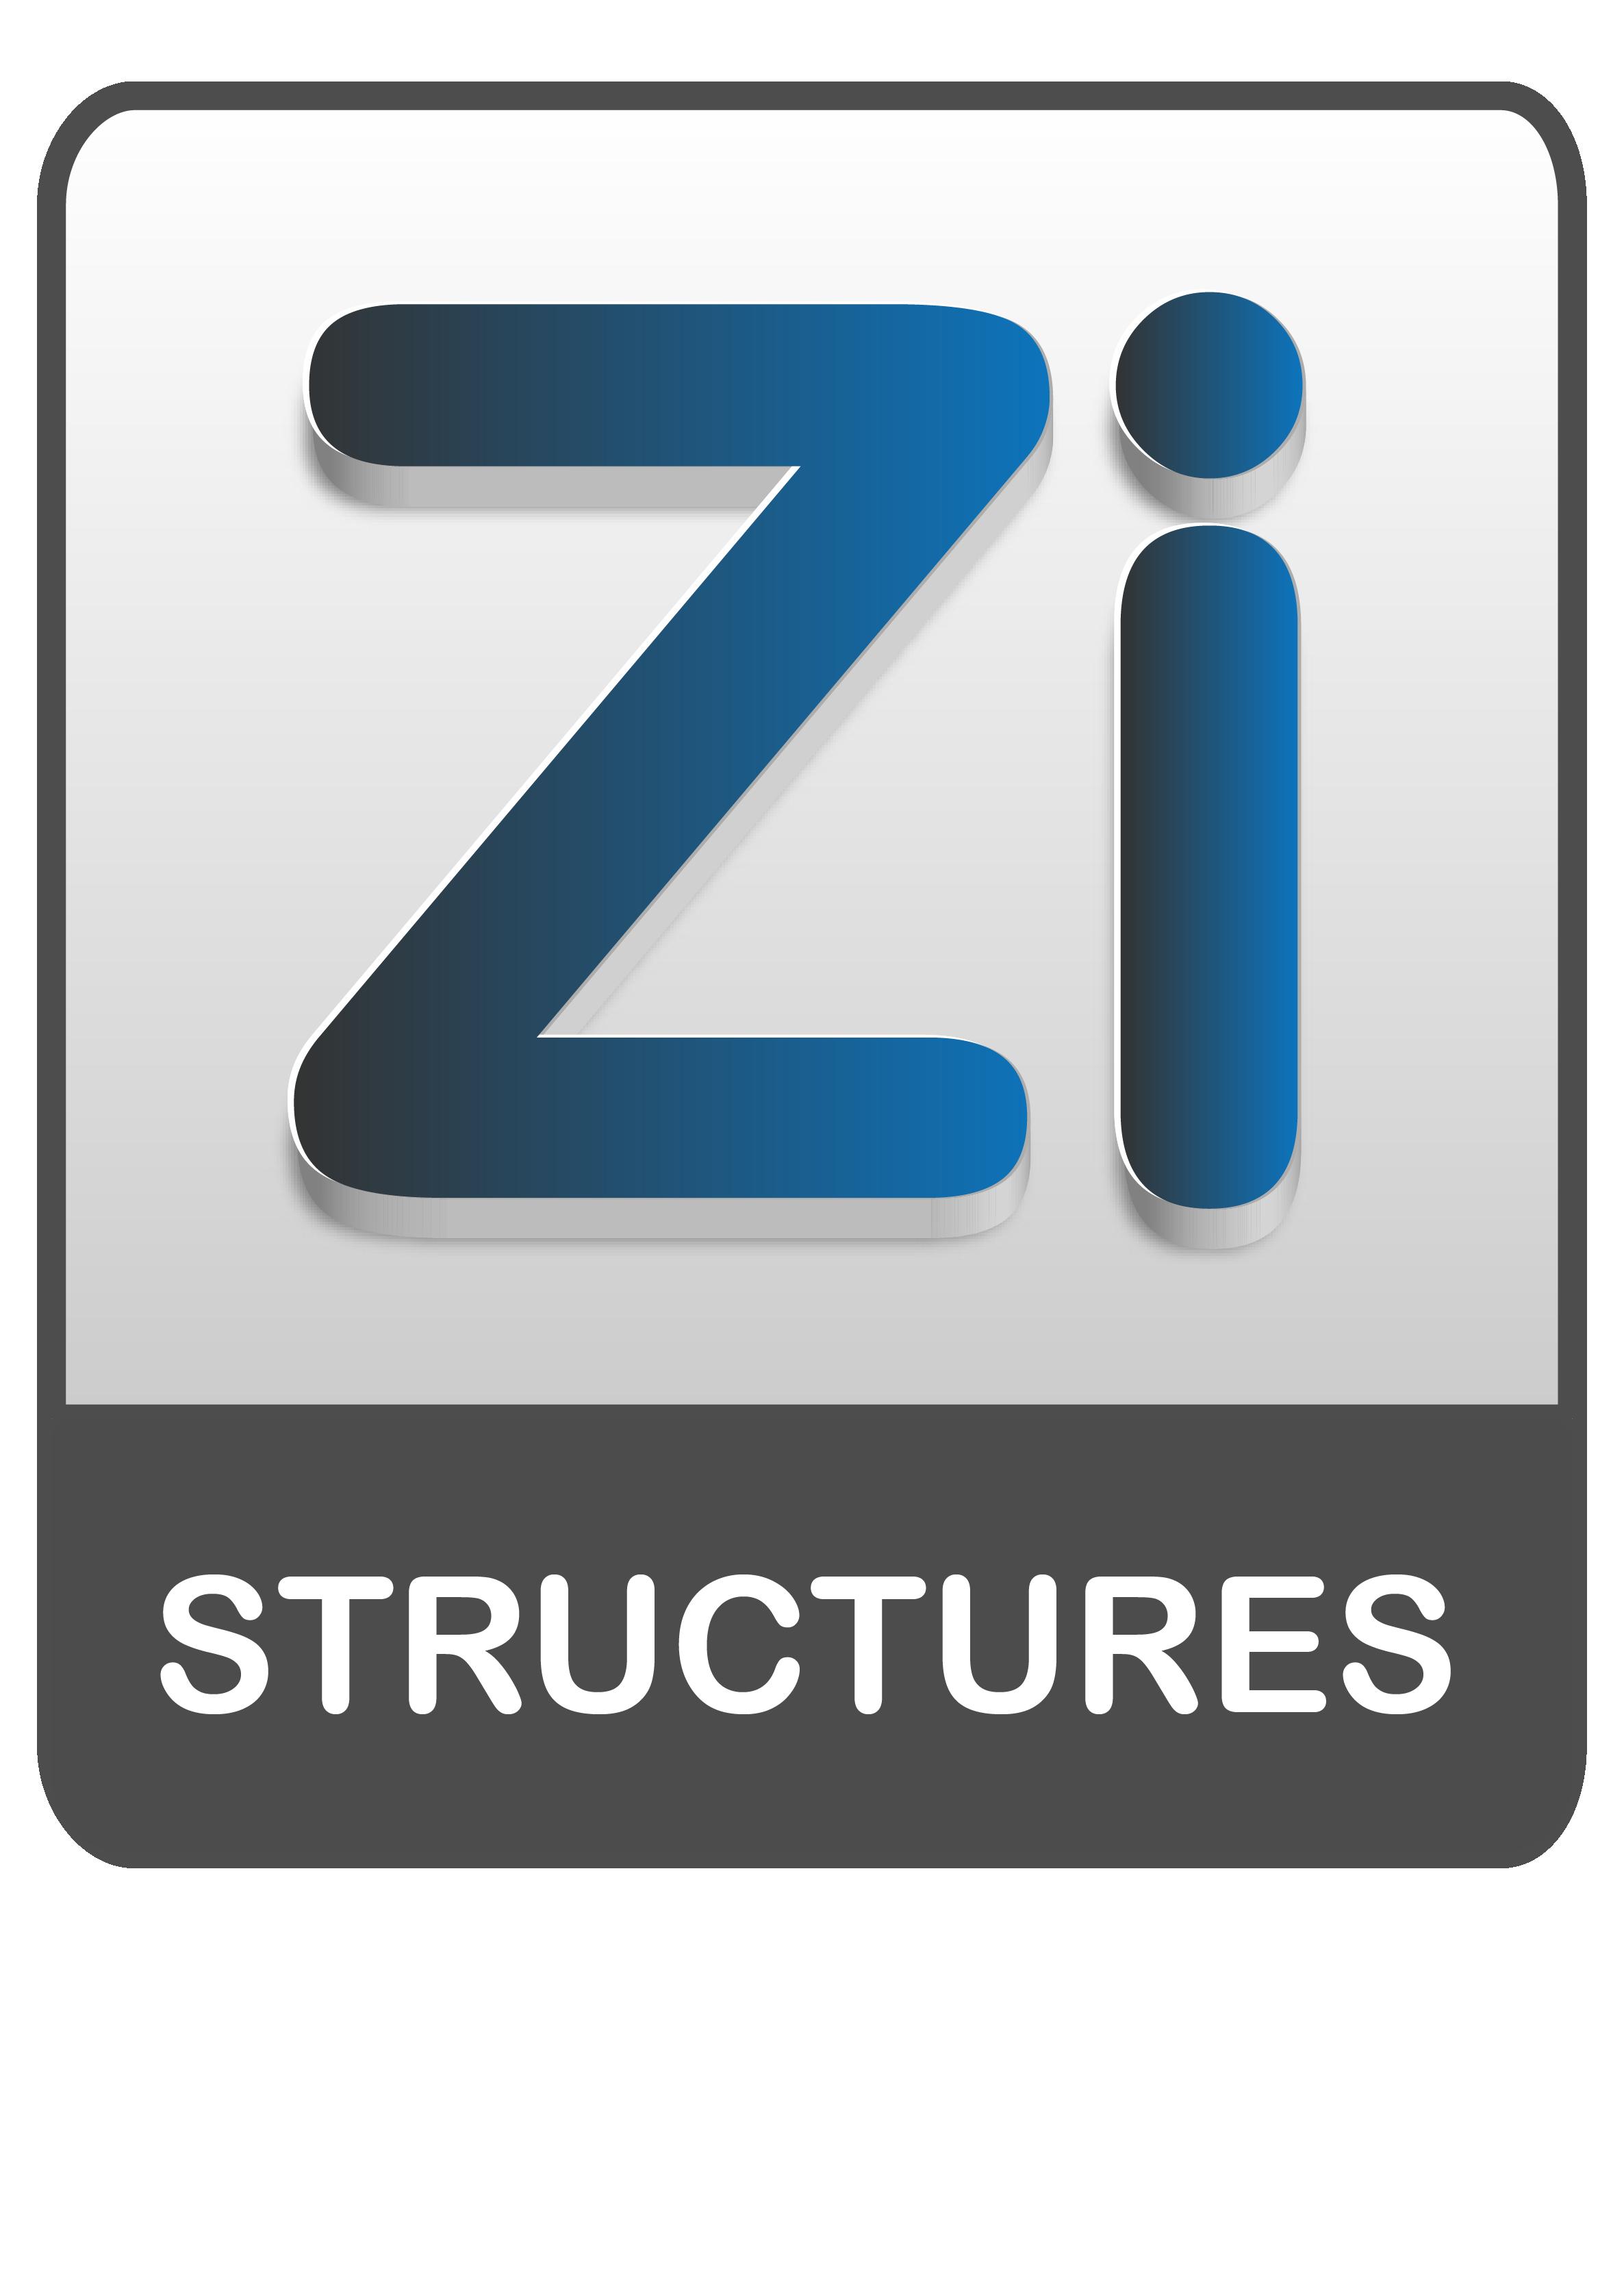 Peri-Peri-Creative-zipcord-industries-logo2017_Zipcord-Structures